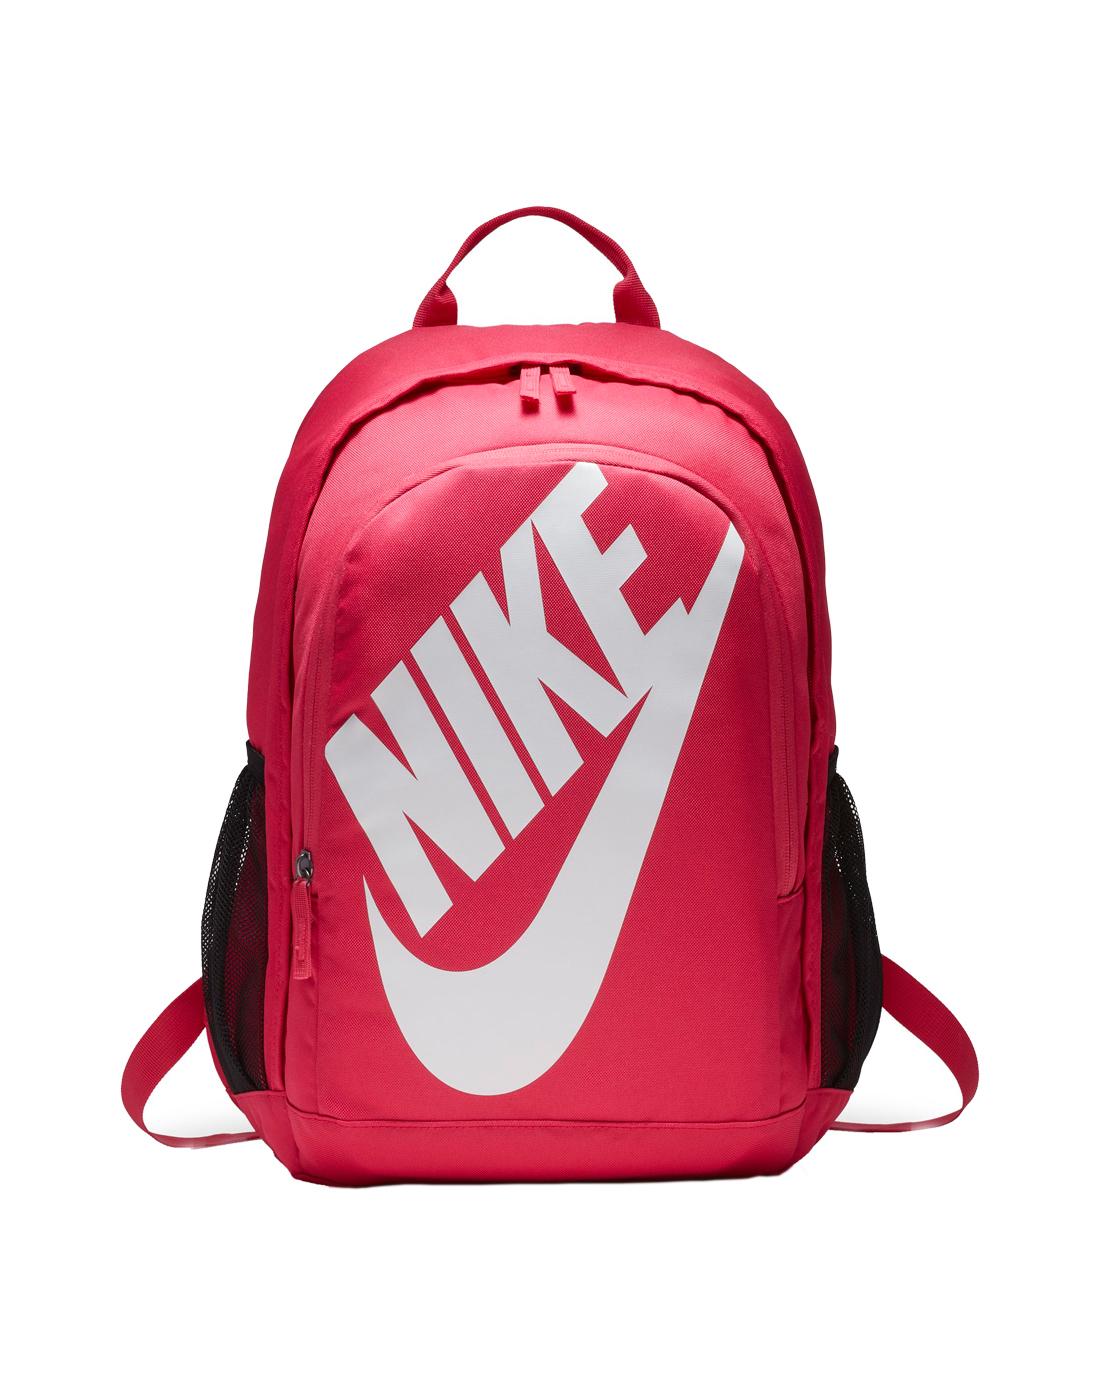 Intervenir ignorar Aspirar  Nike Hayward Futura Backpack - Pink | Life Style Sports IE